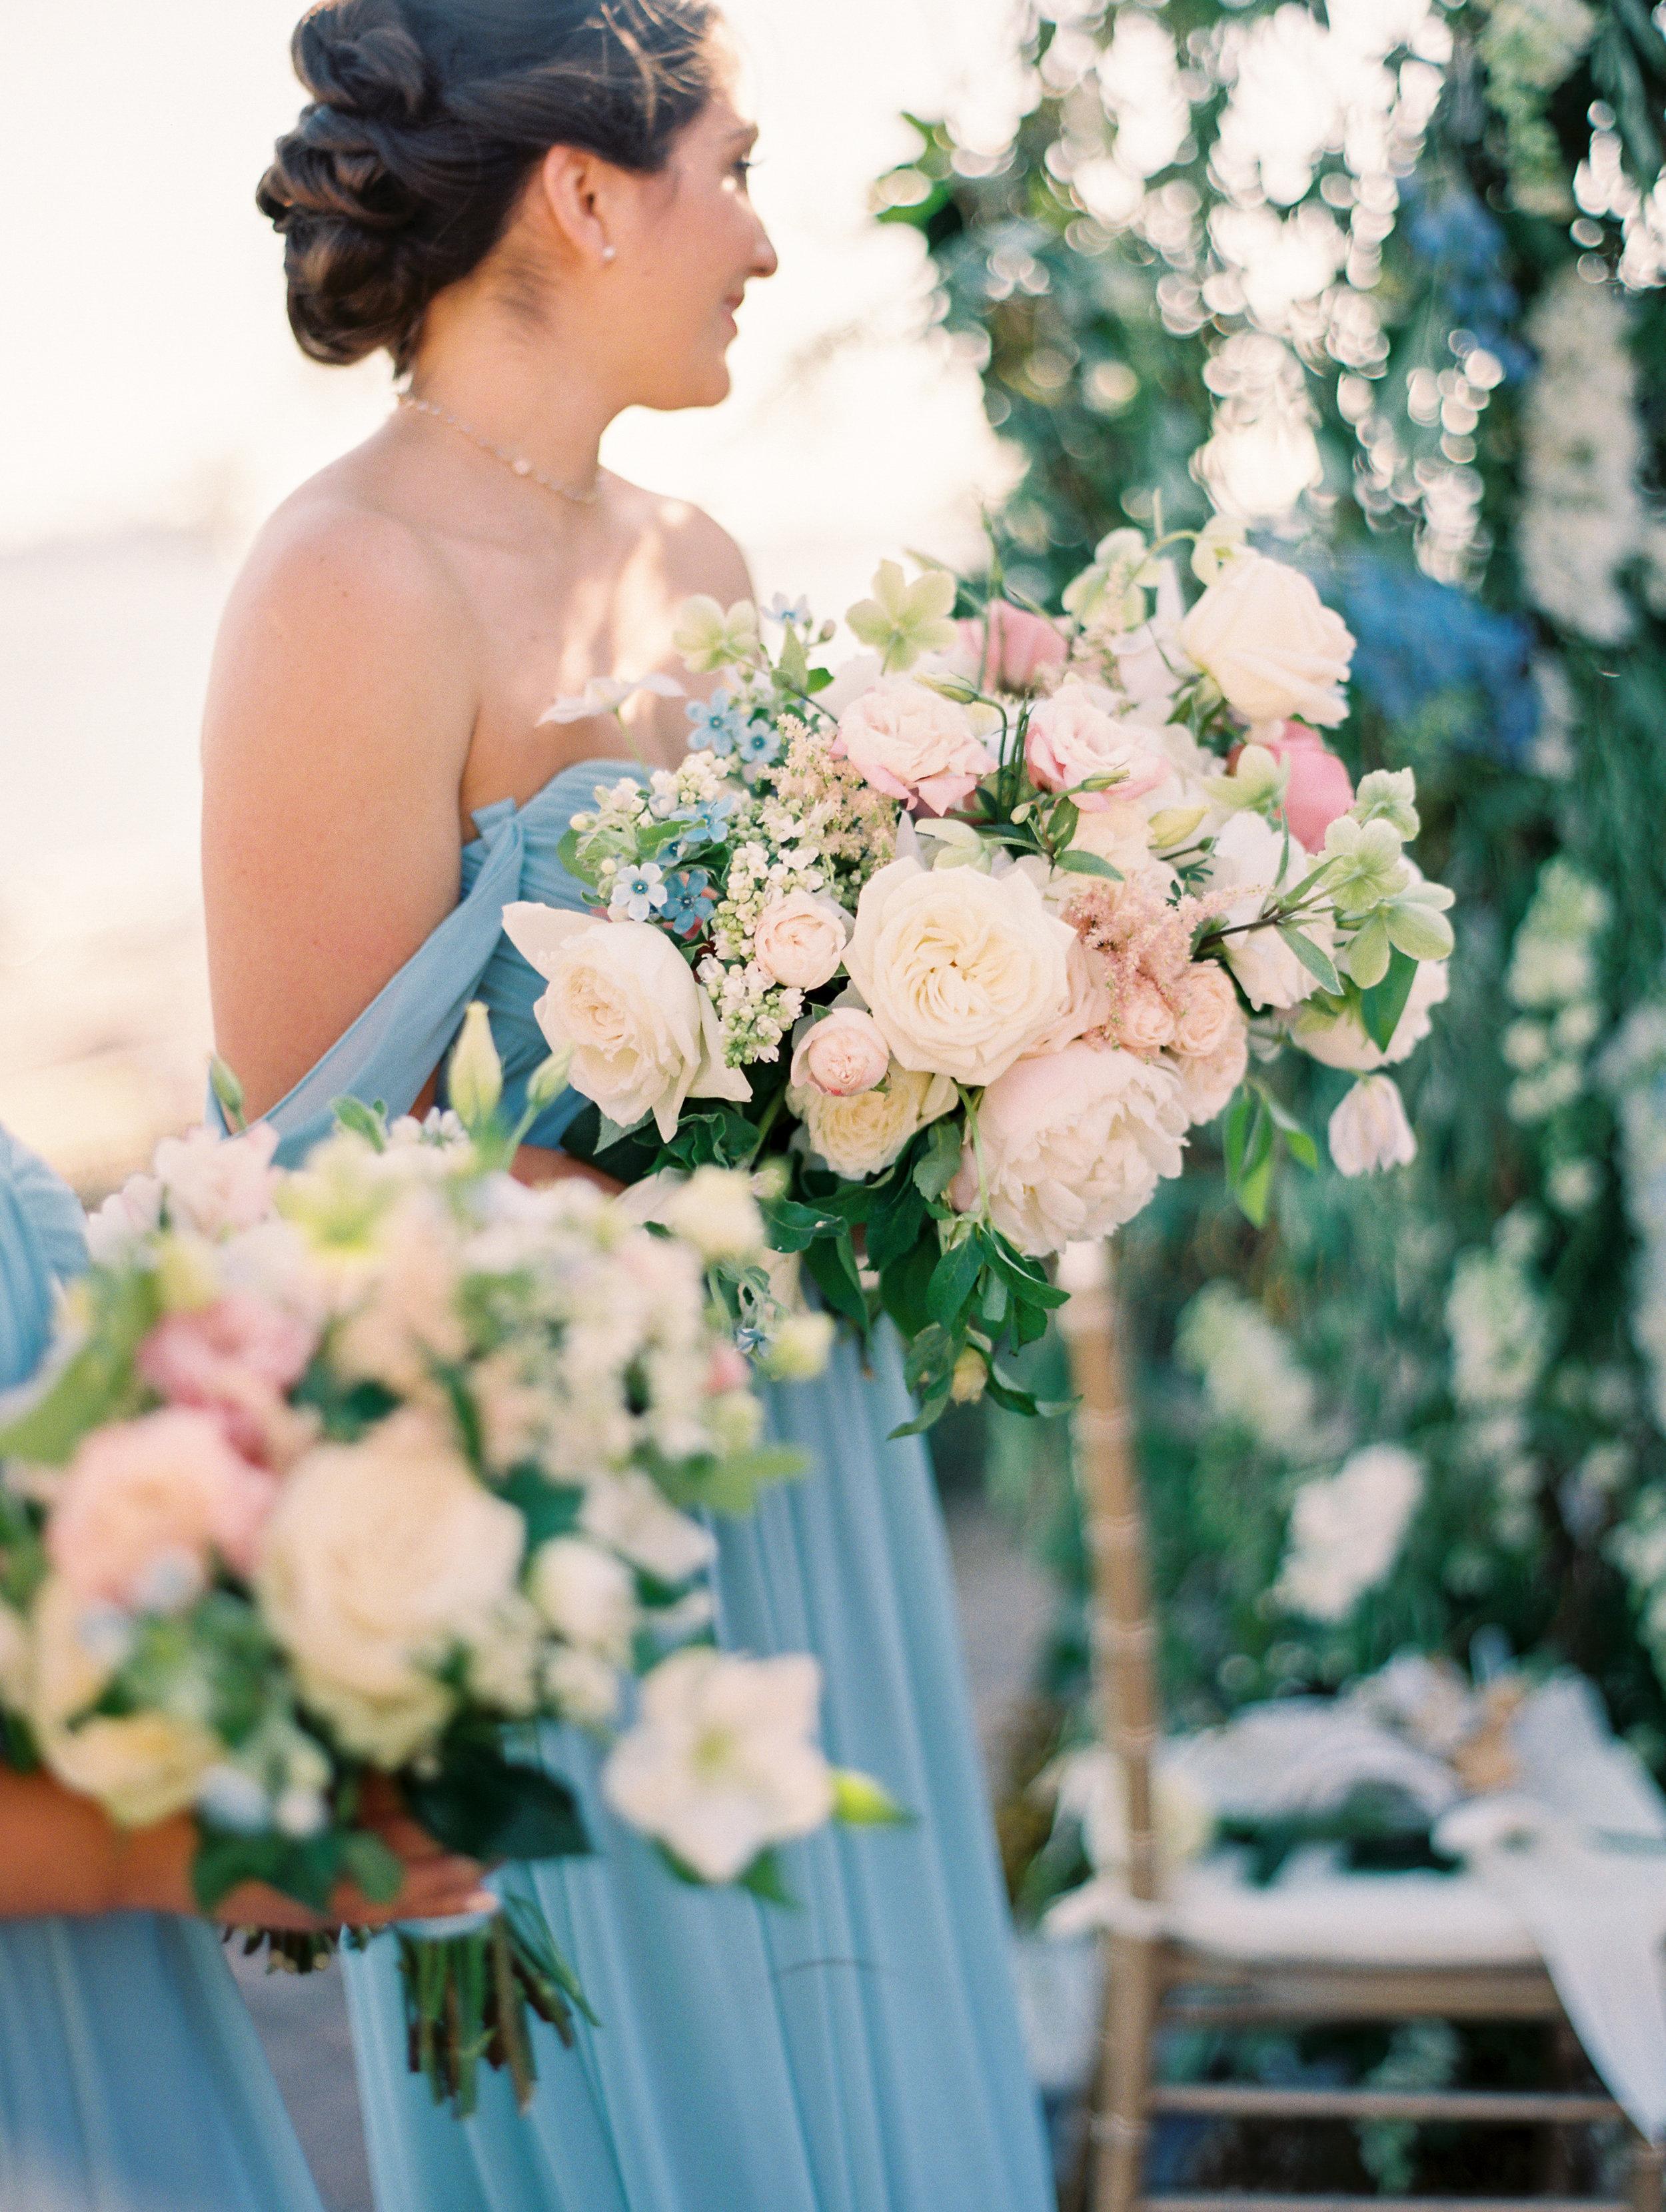 long-beach-museum-of-art-wedding-planner-luxury-wedding-planner-socal57.jpg